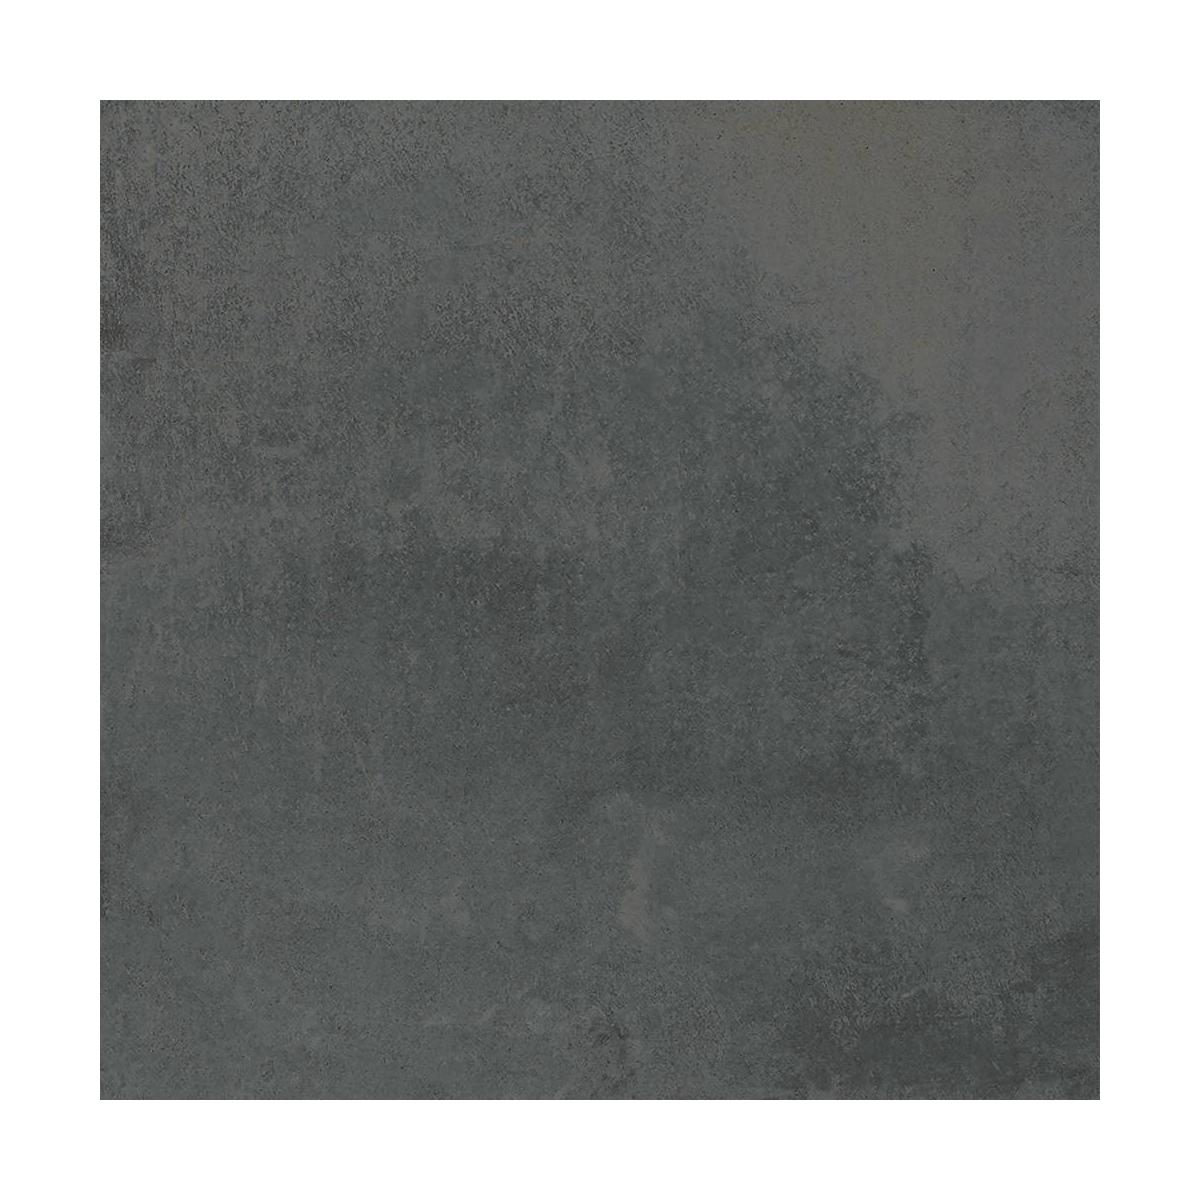 Vulcano Galena - Imitación Metal - Marca Grespania